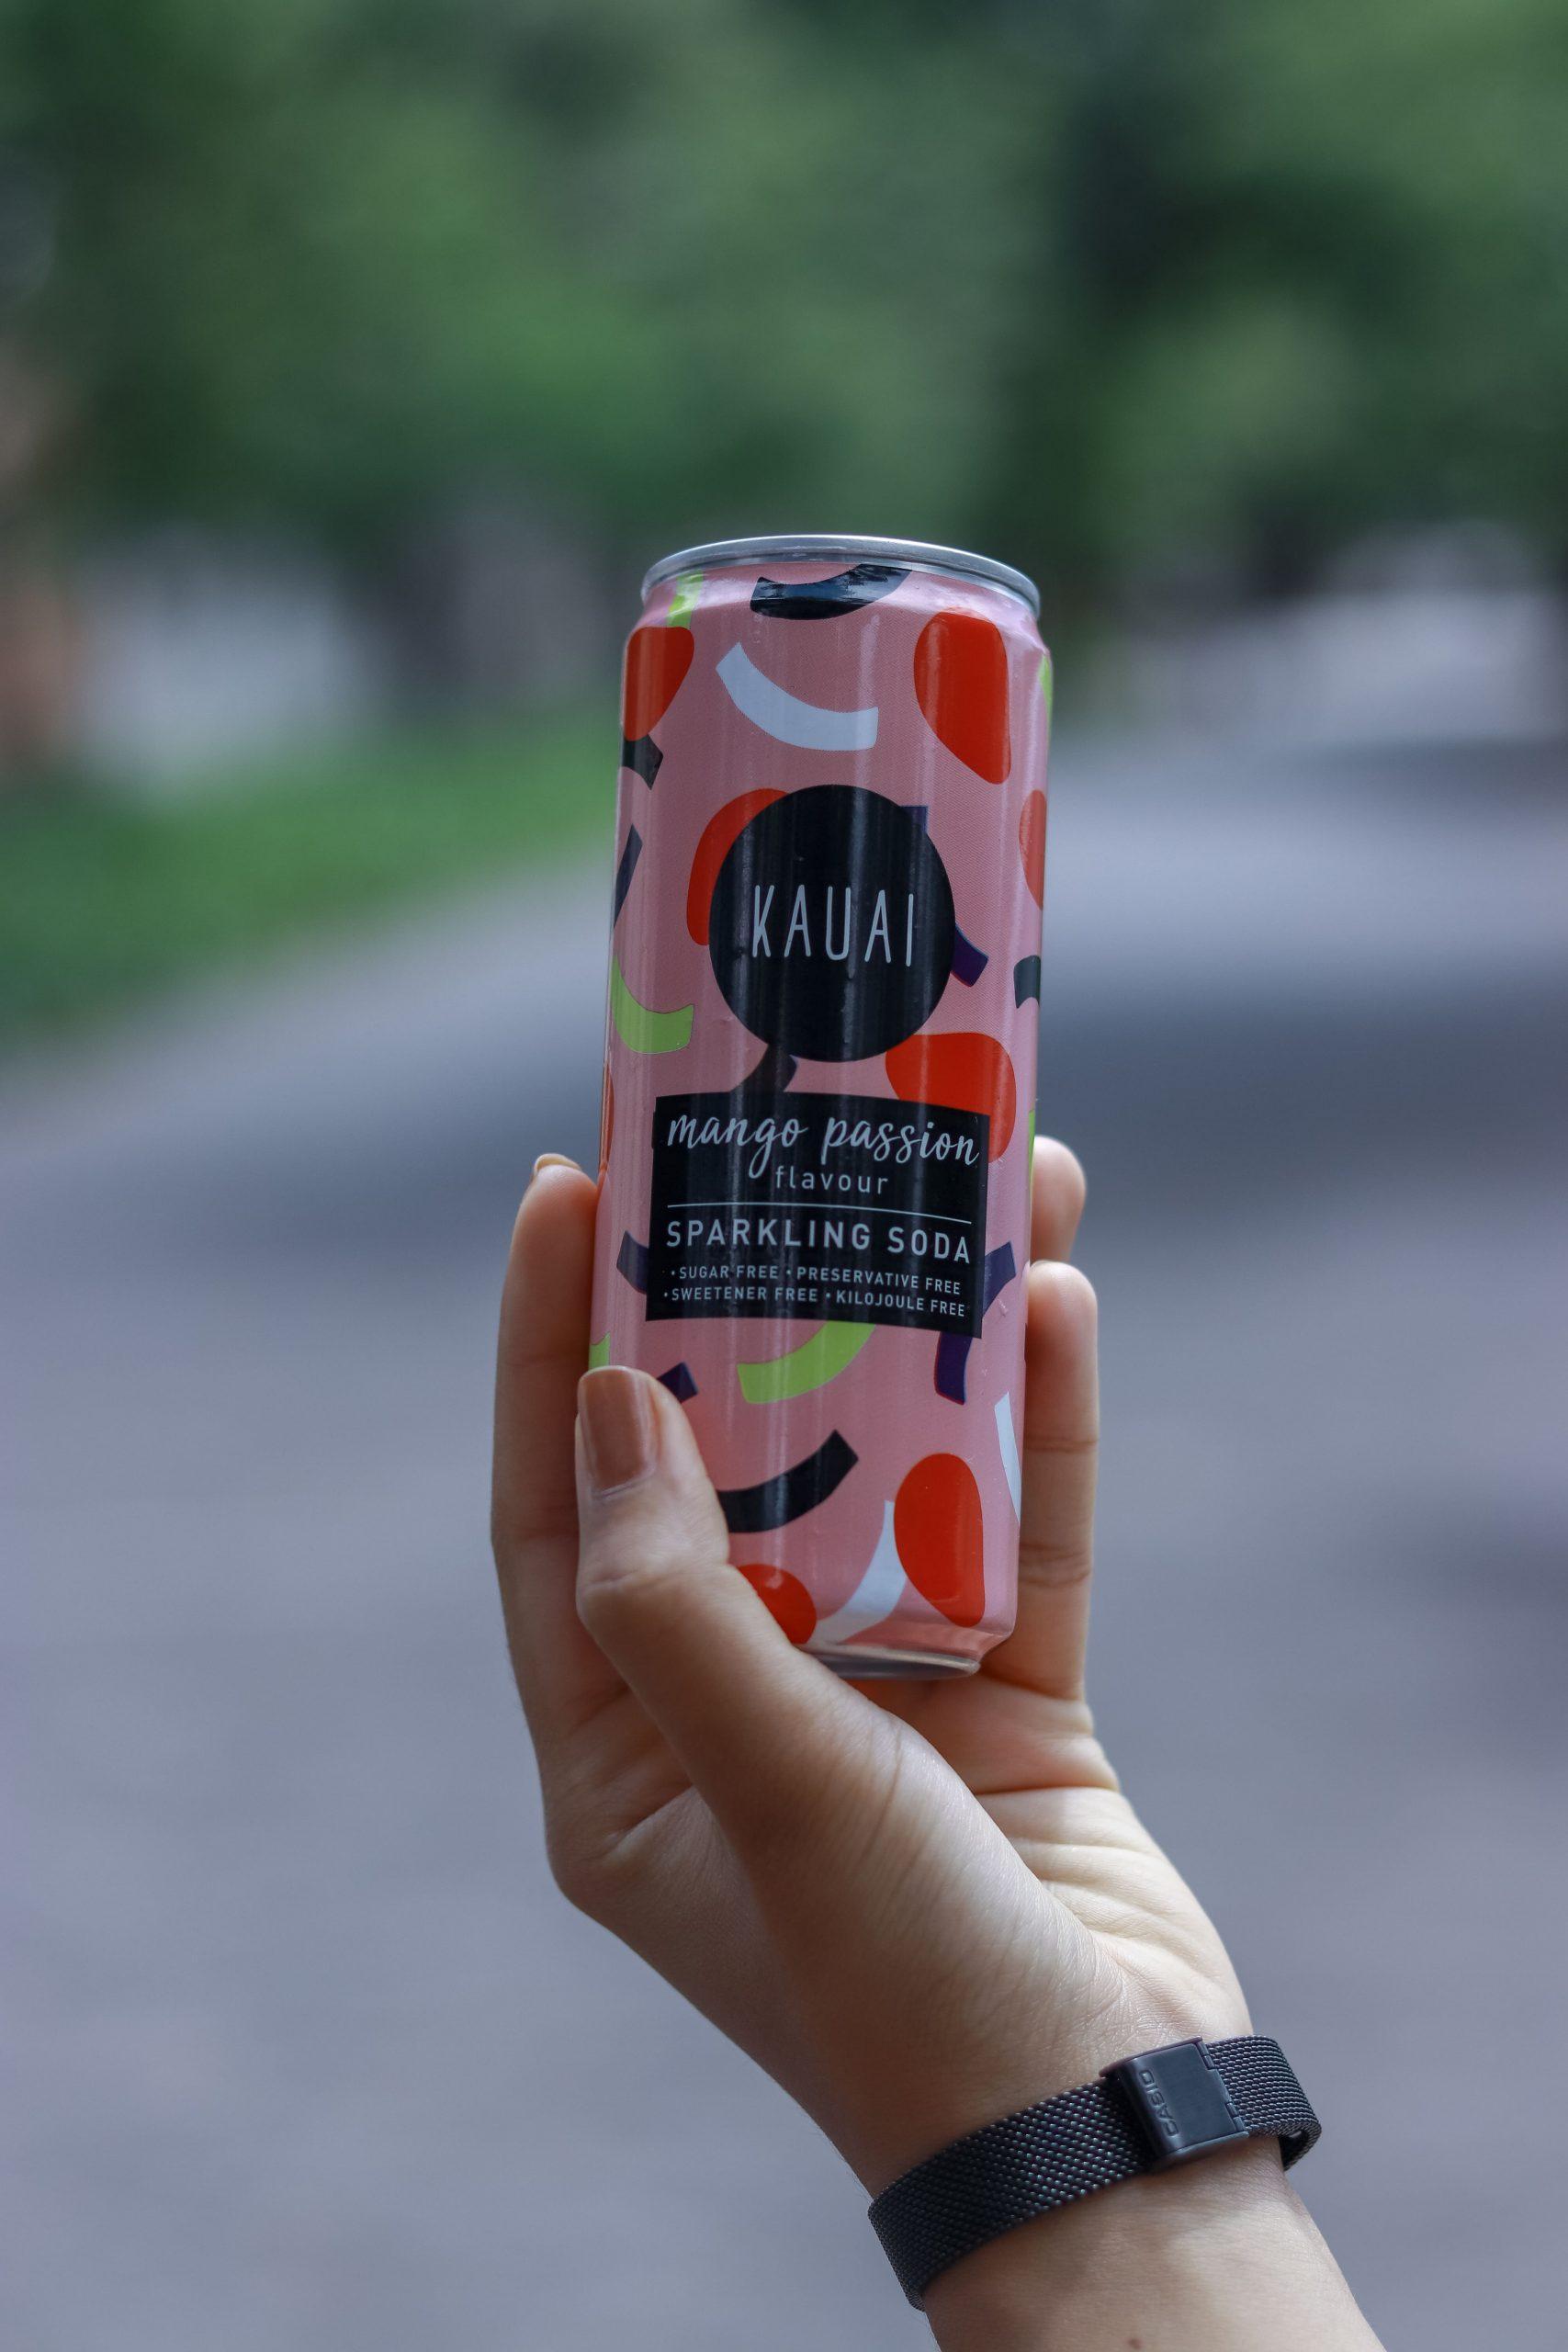 Kauai Sparkling Soda